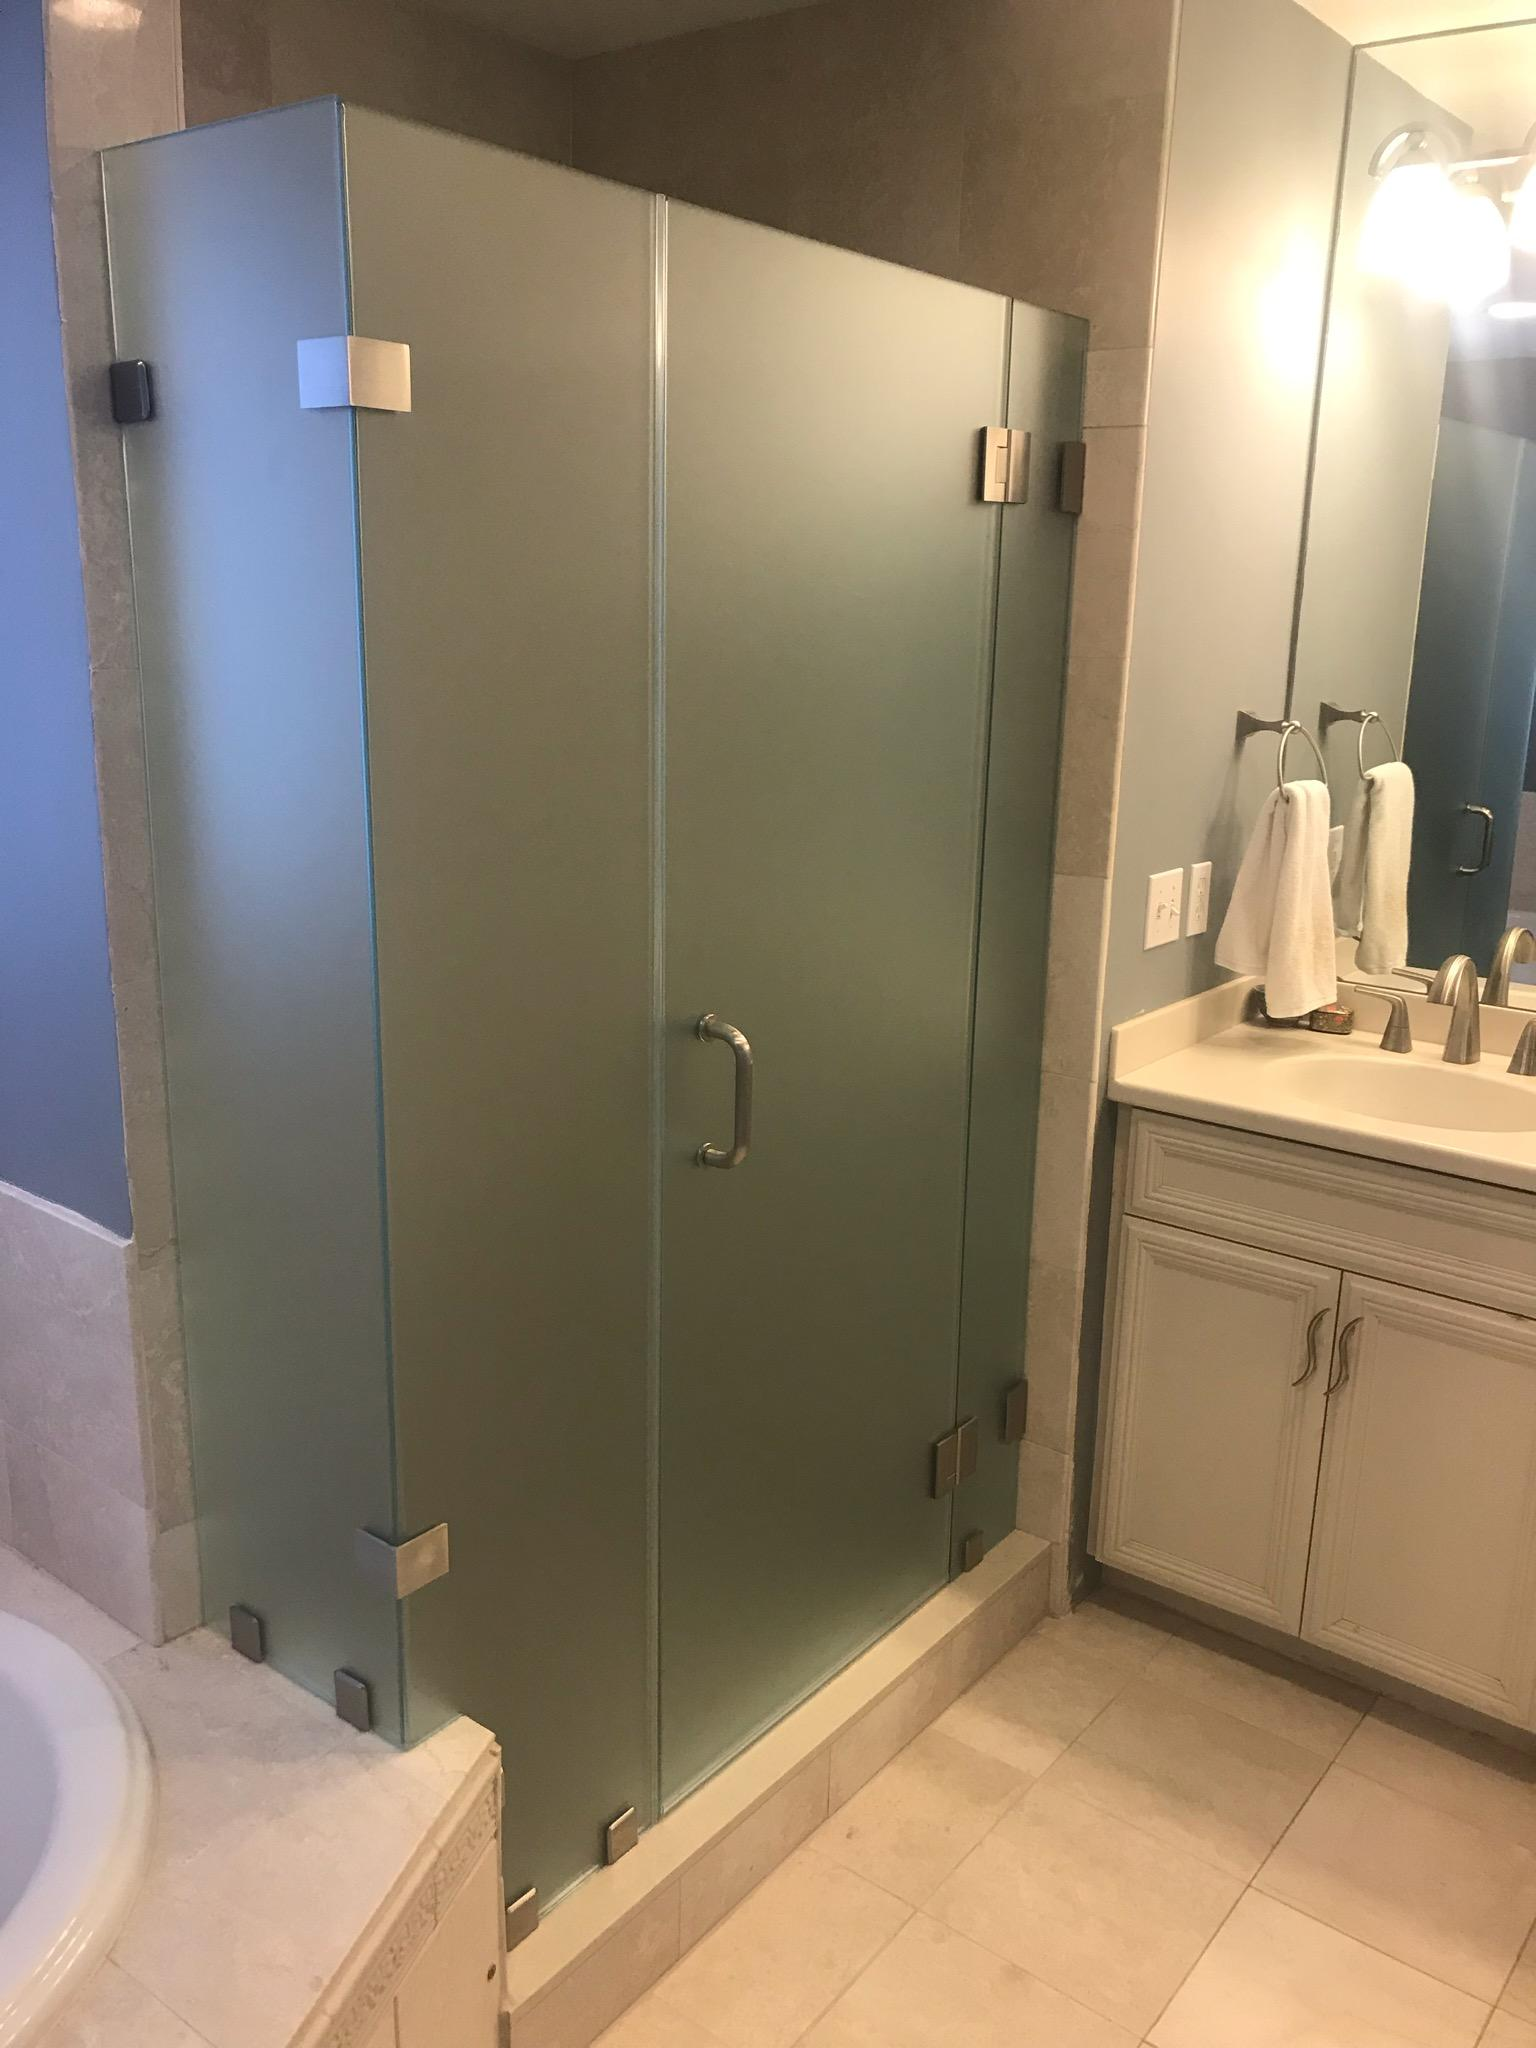 Wang Acid-Washed Glass Shower